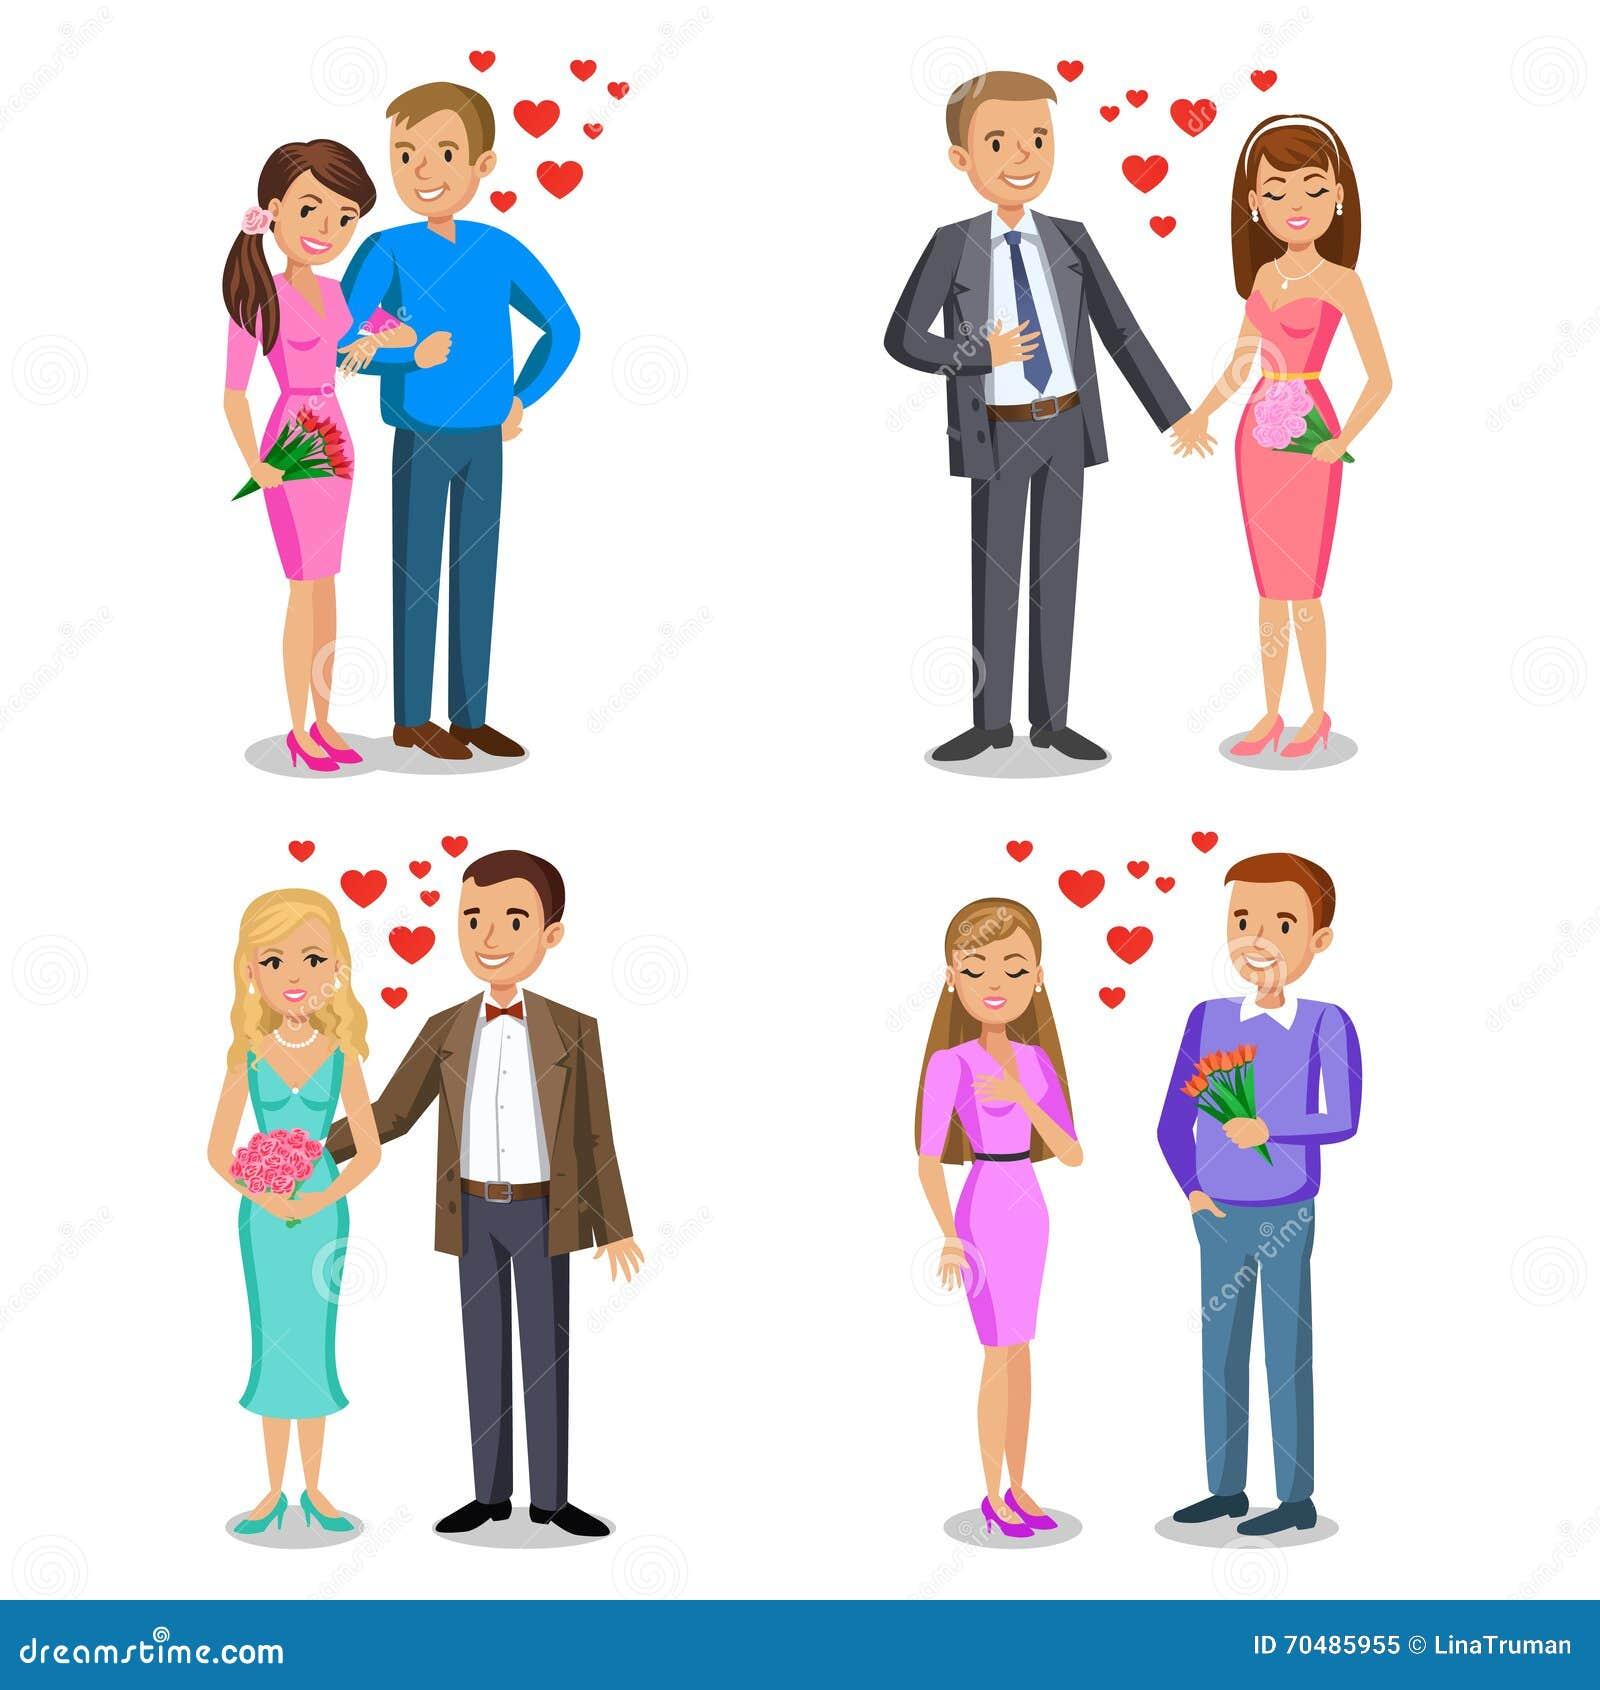 Set of Happy couples. Romantic couple, love, relationship